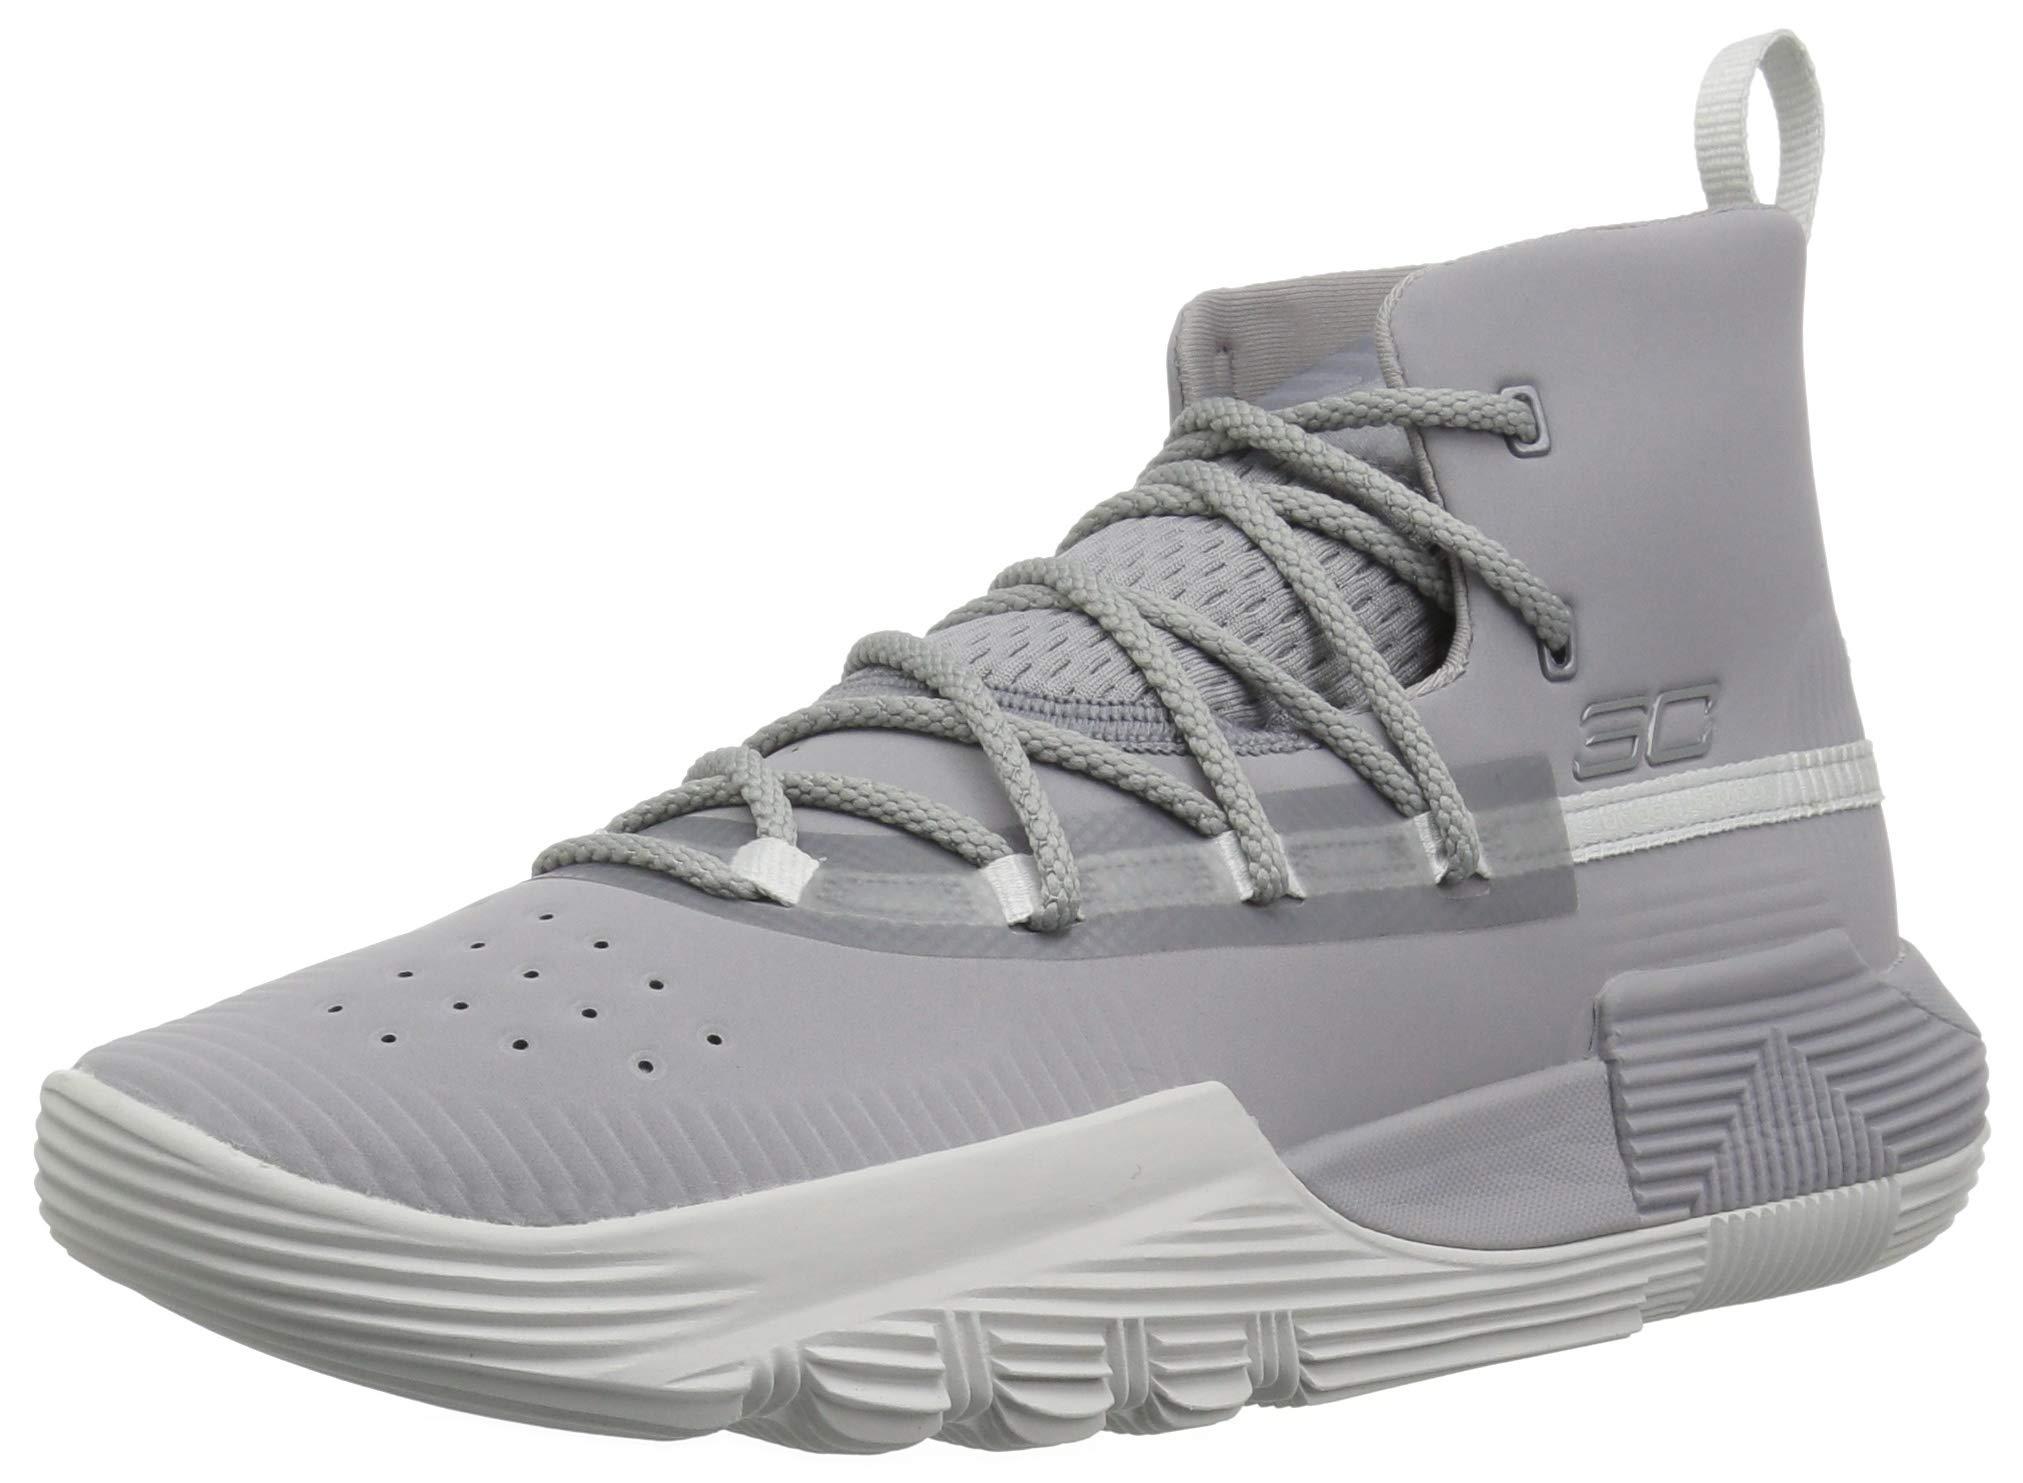 Under Armour Boys' Grade School SC 3Zer0 II Basketball Shoe, 101/Steel, 6